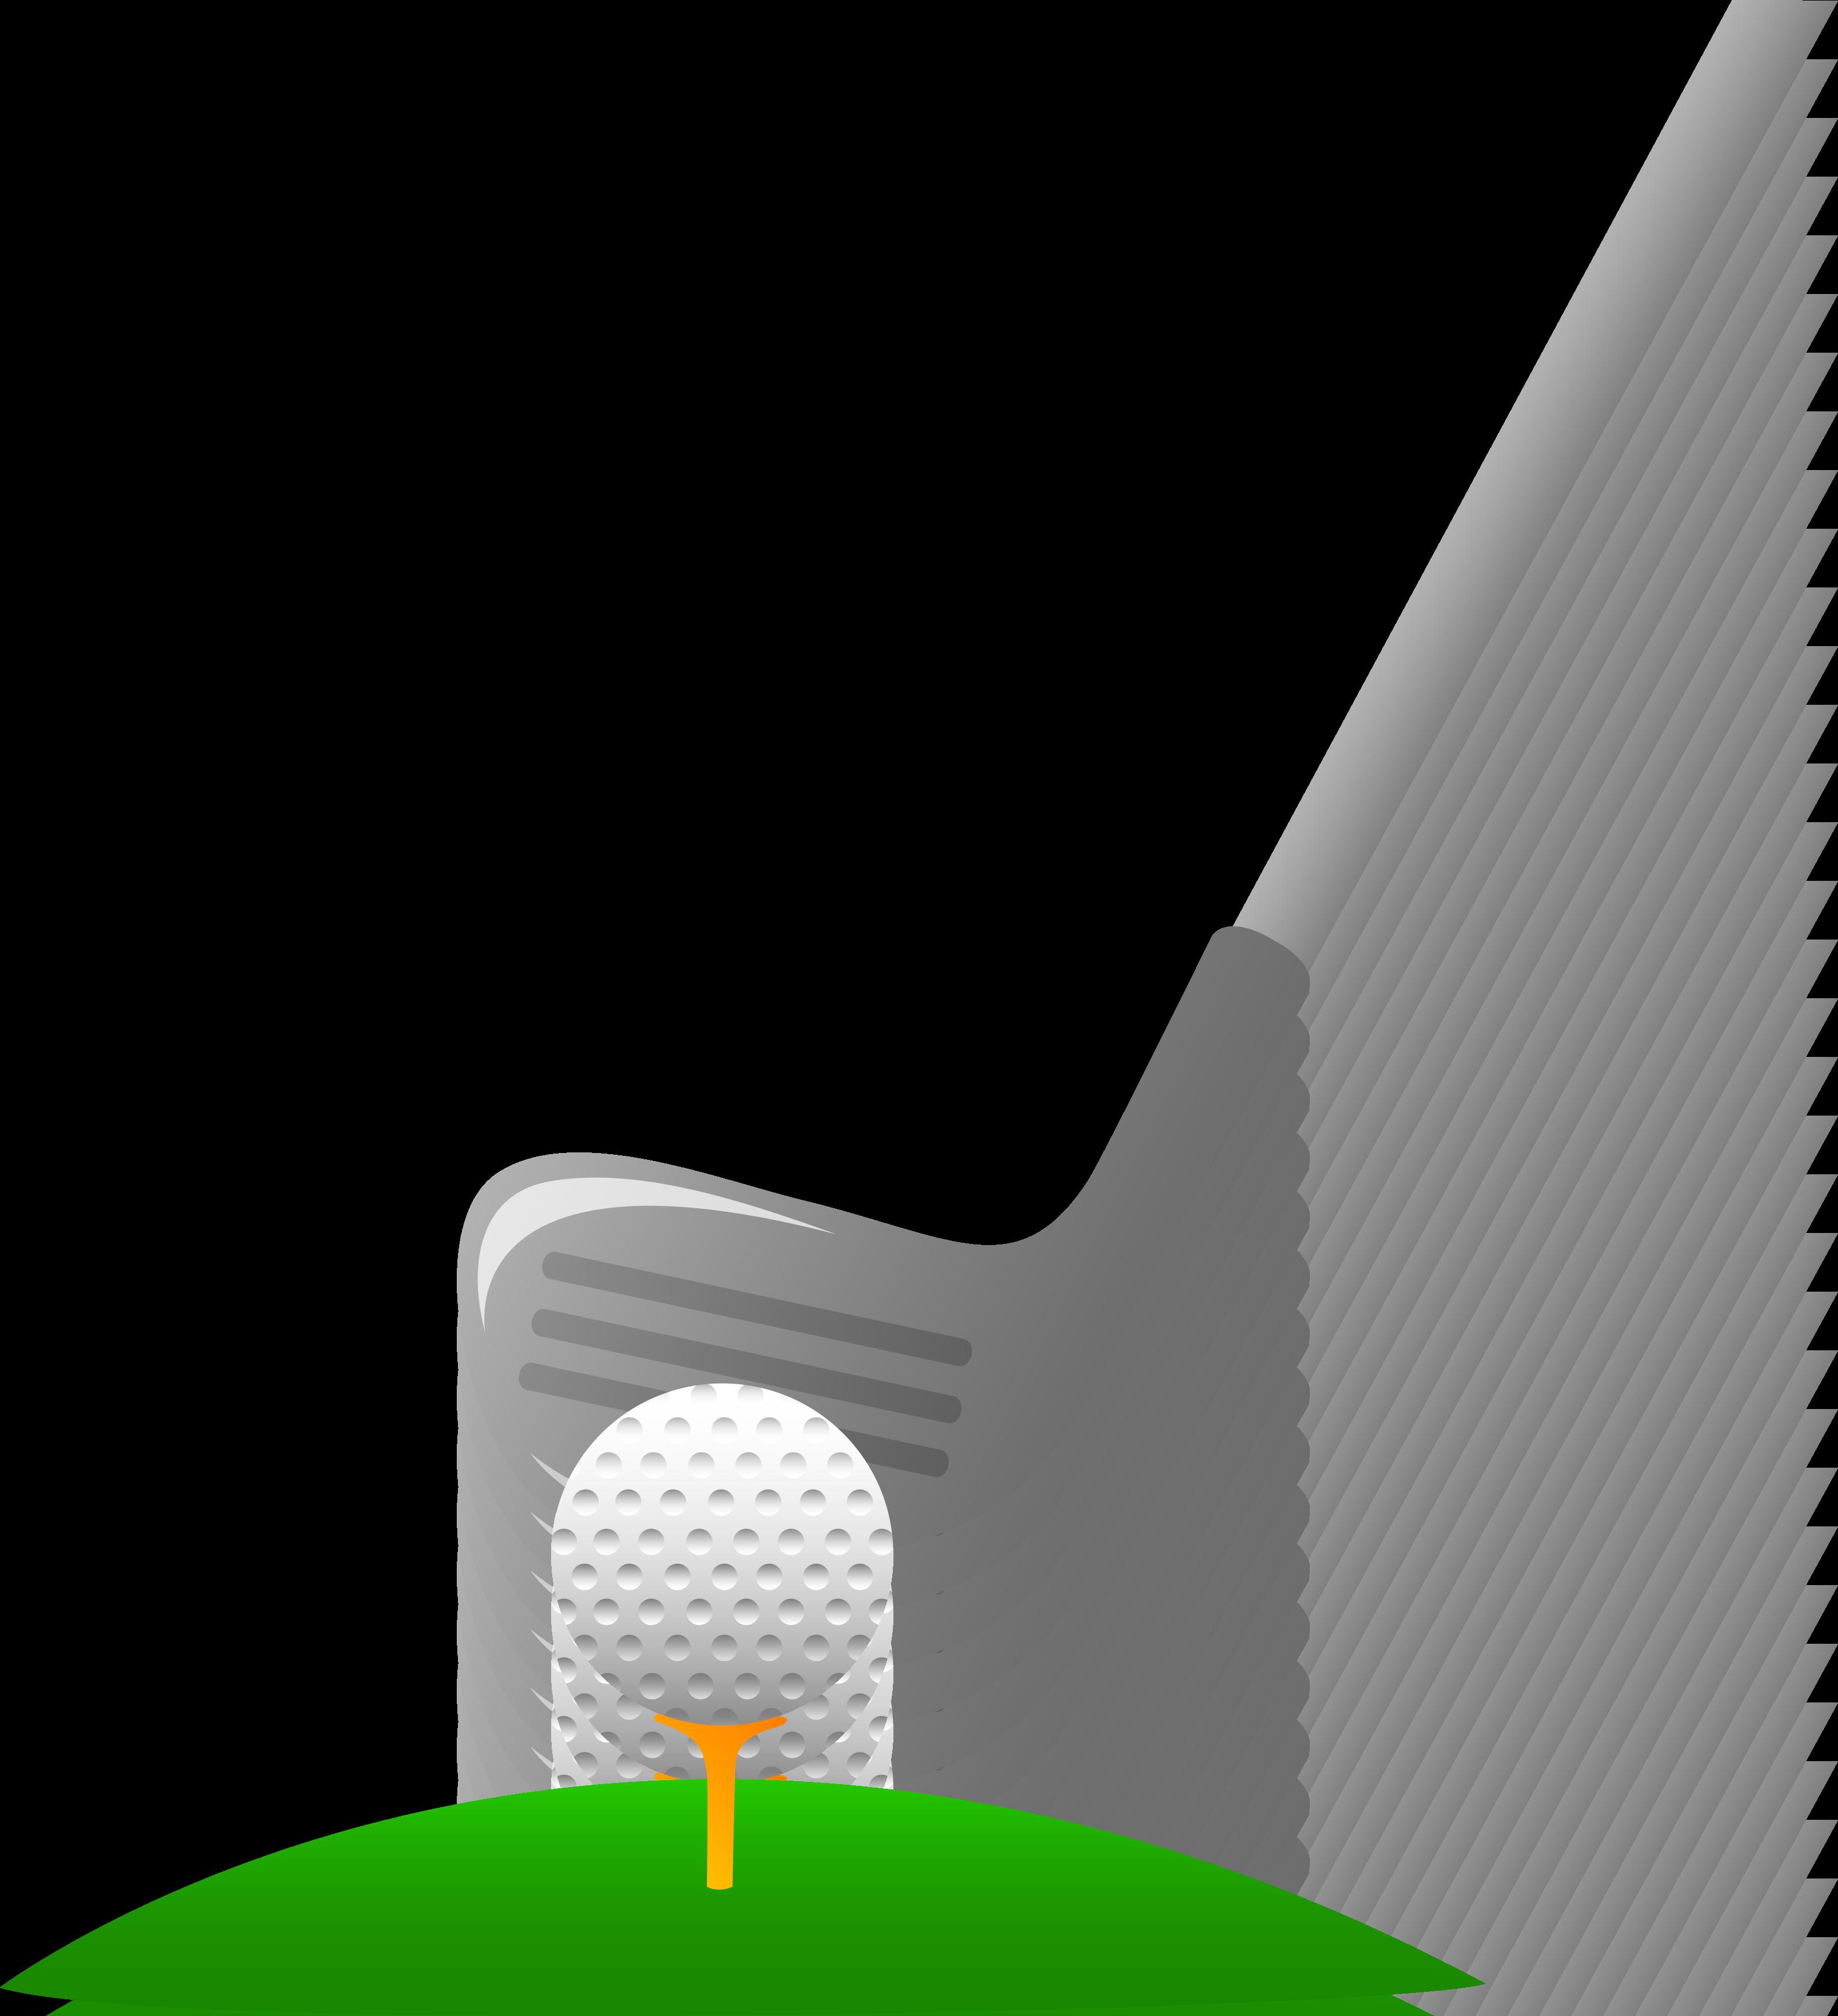 Golf Club And Ball Clipart #1